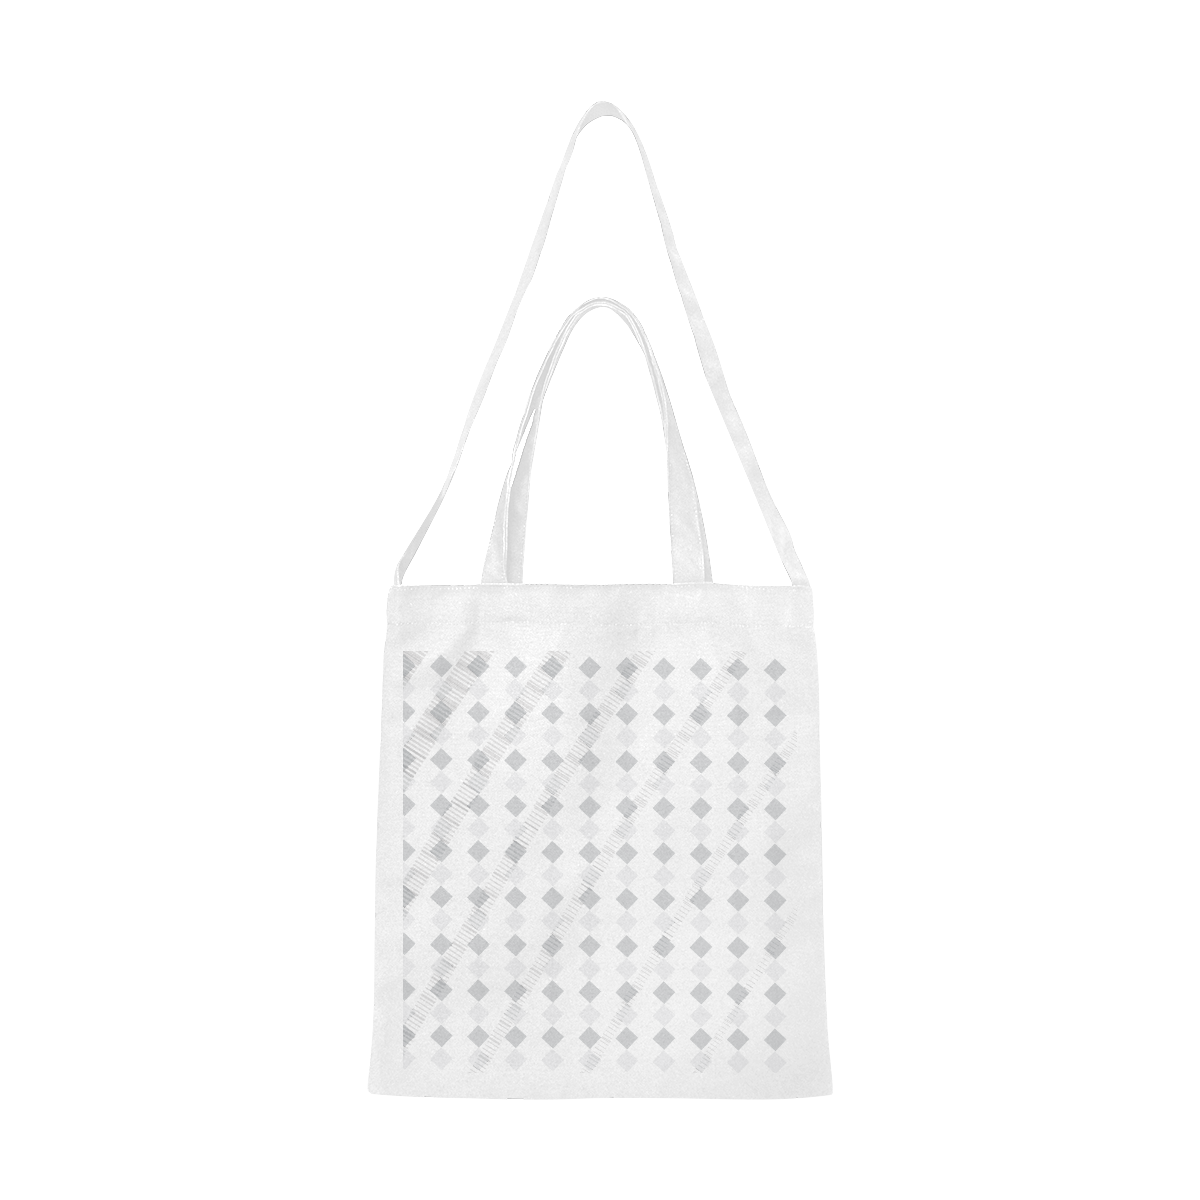 Checker bag Canvas Tote Bag/Medium (Model 1701)